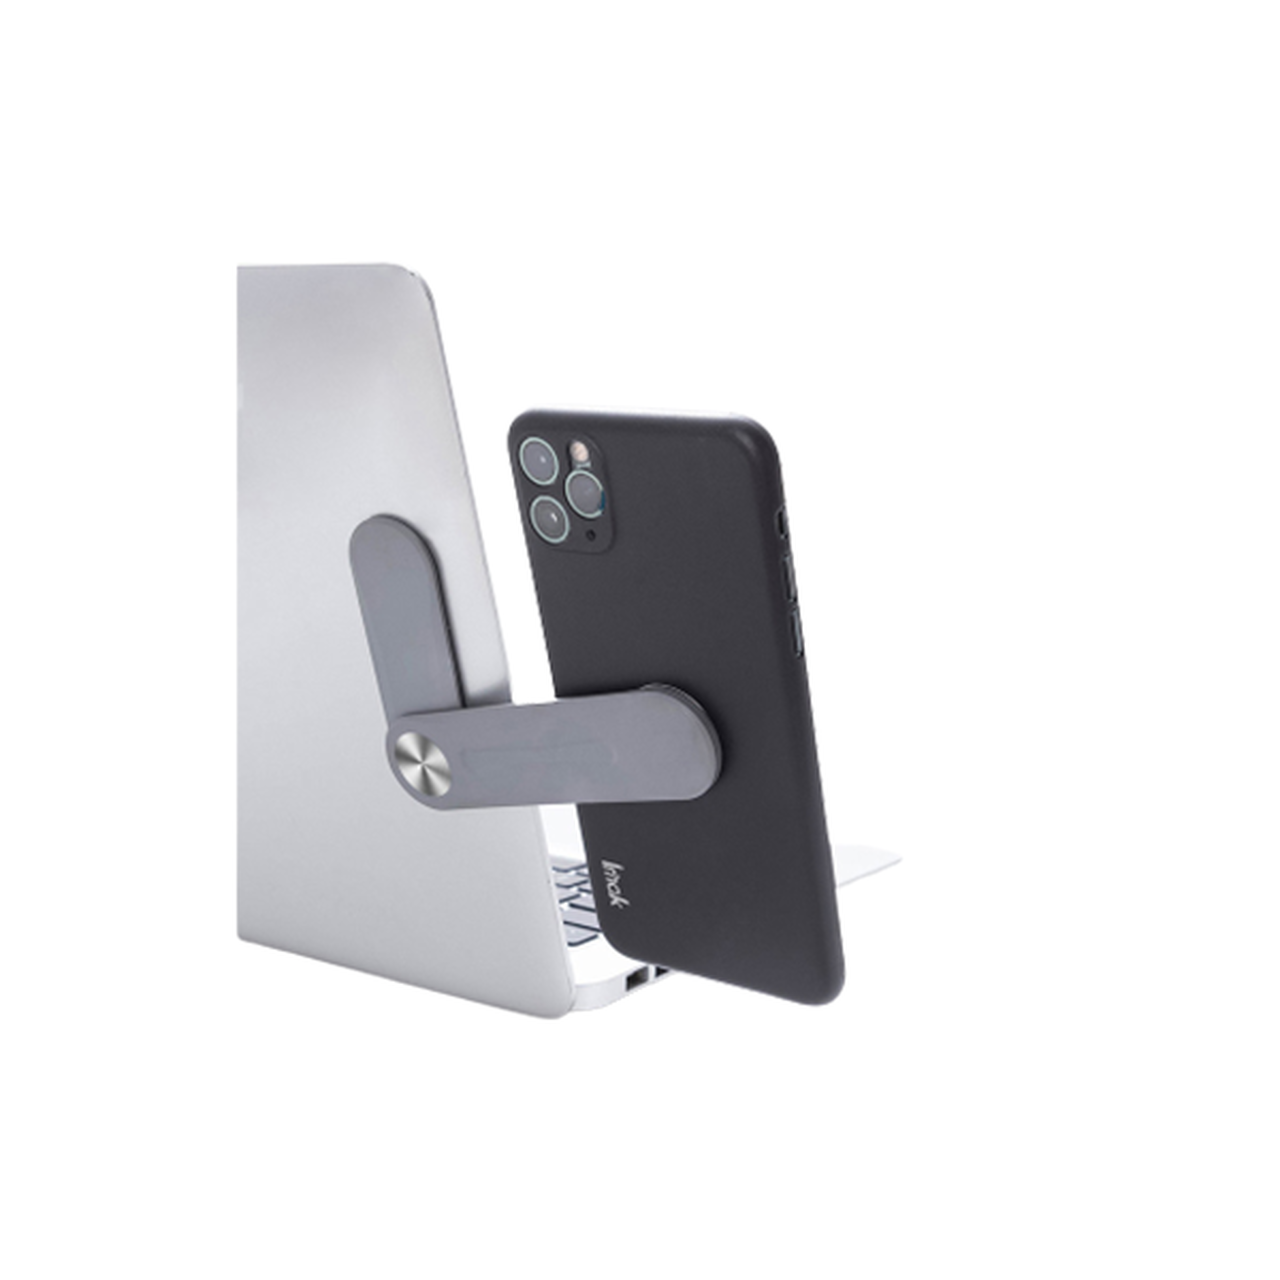 Eazy-Arm Laptop Phone Holder $9.99 (75% OFF)